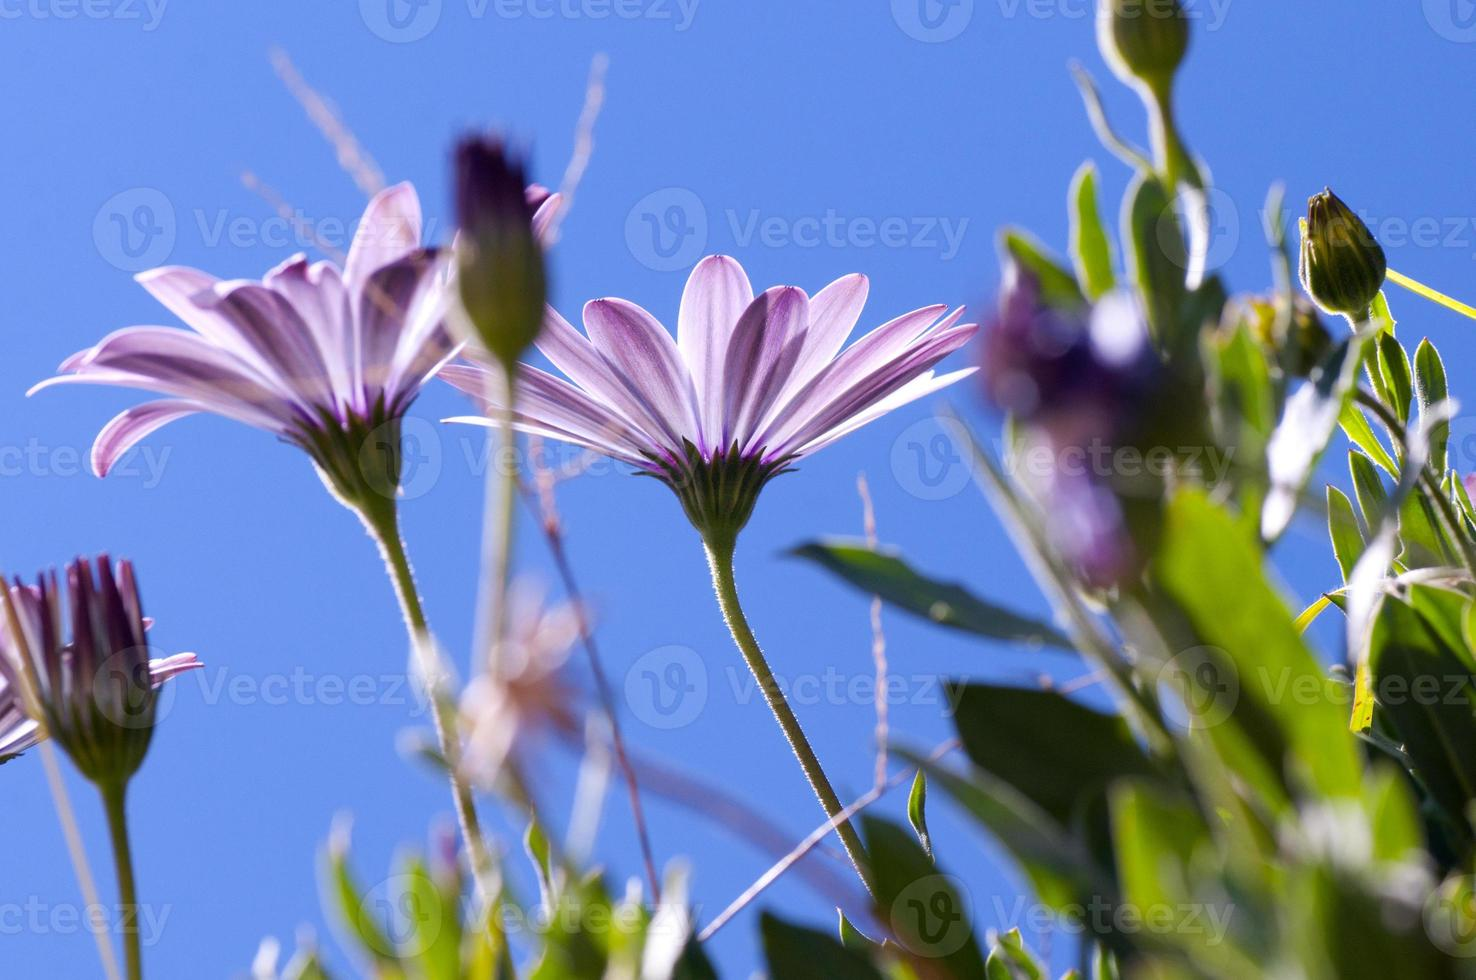 färgrik blomma på blå himmelbakgrund foto